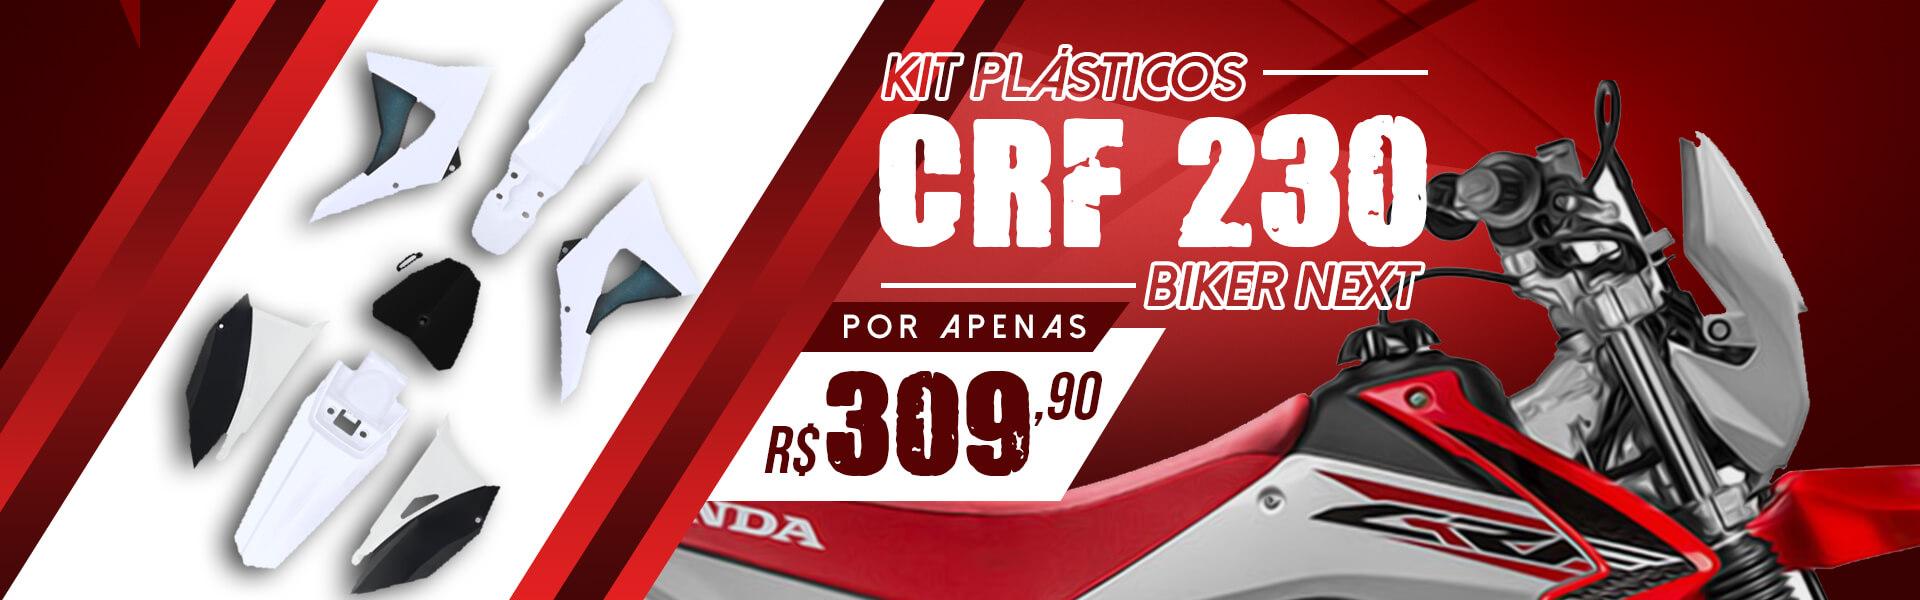 Kit Plásticos CRF 203 Biker Next